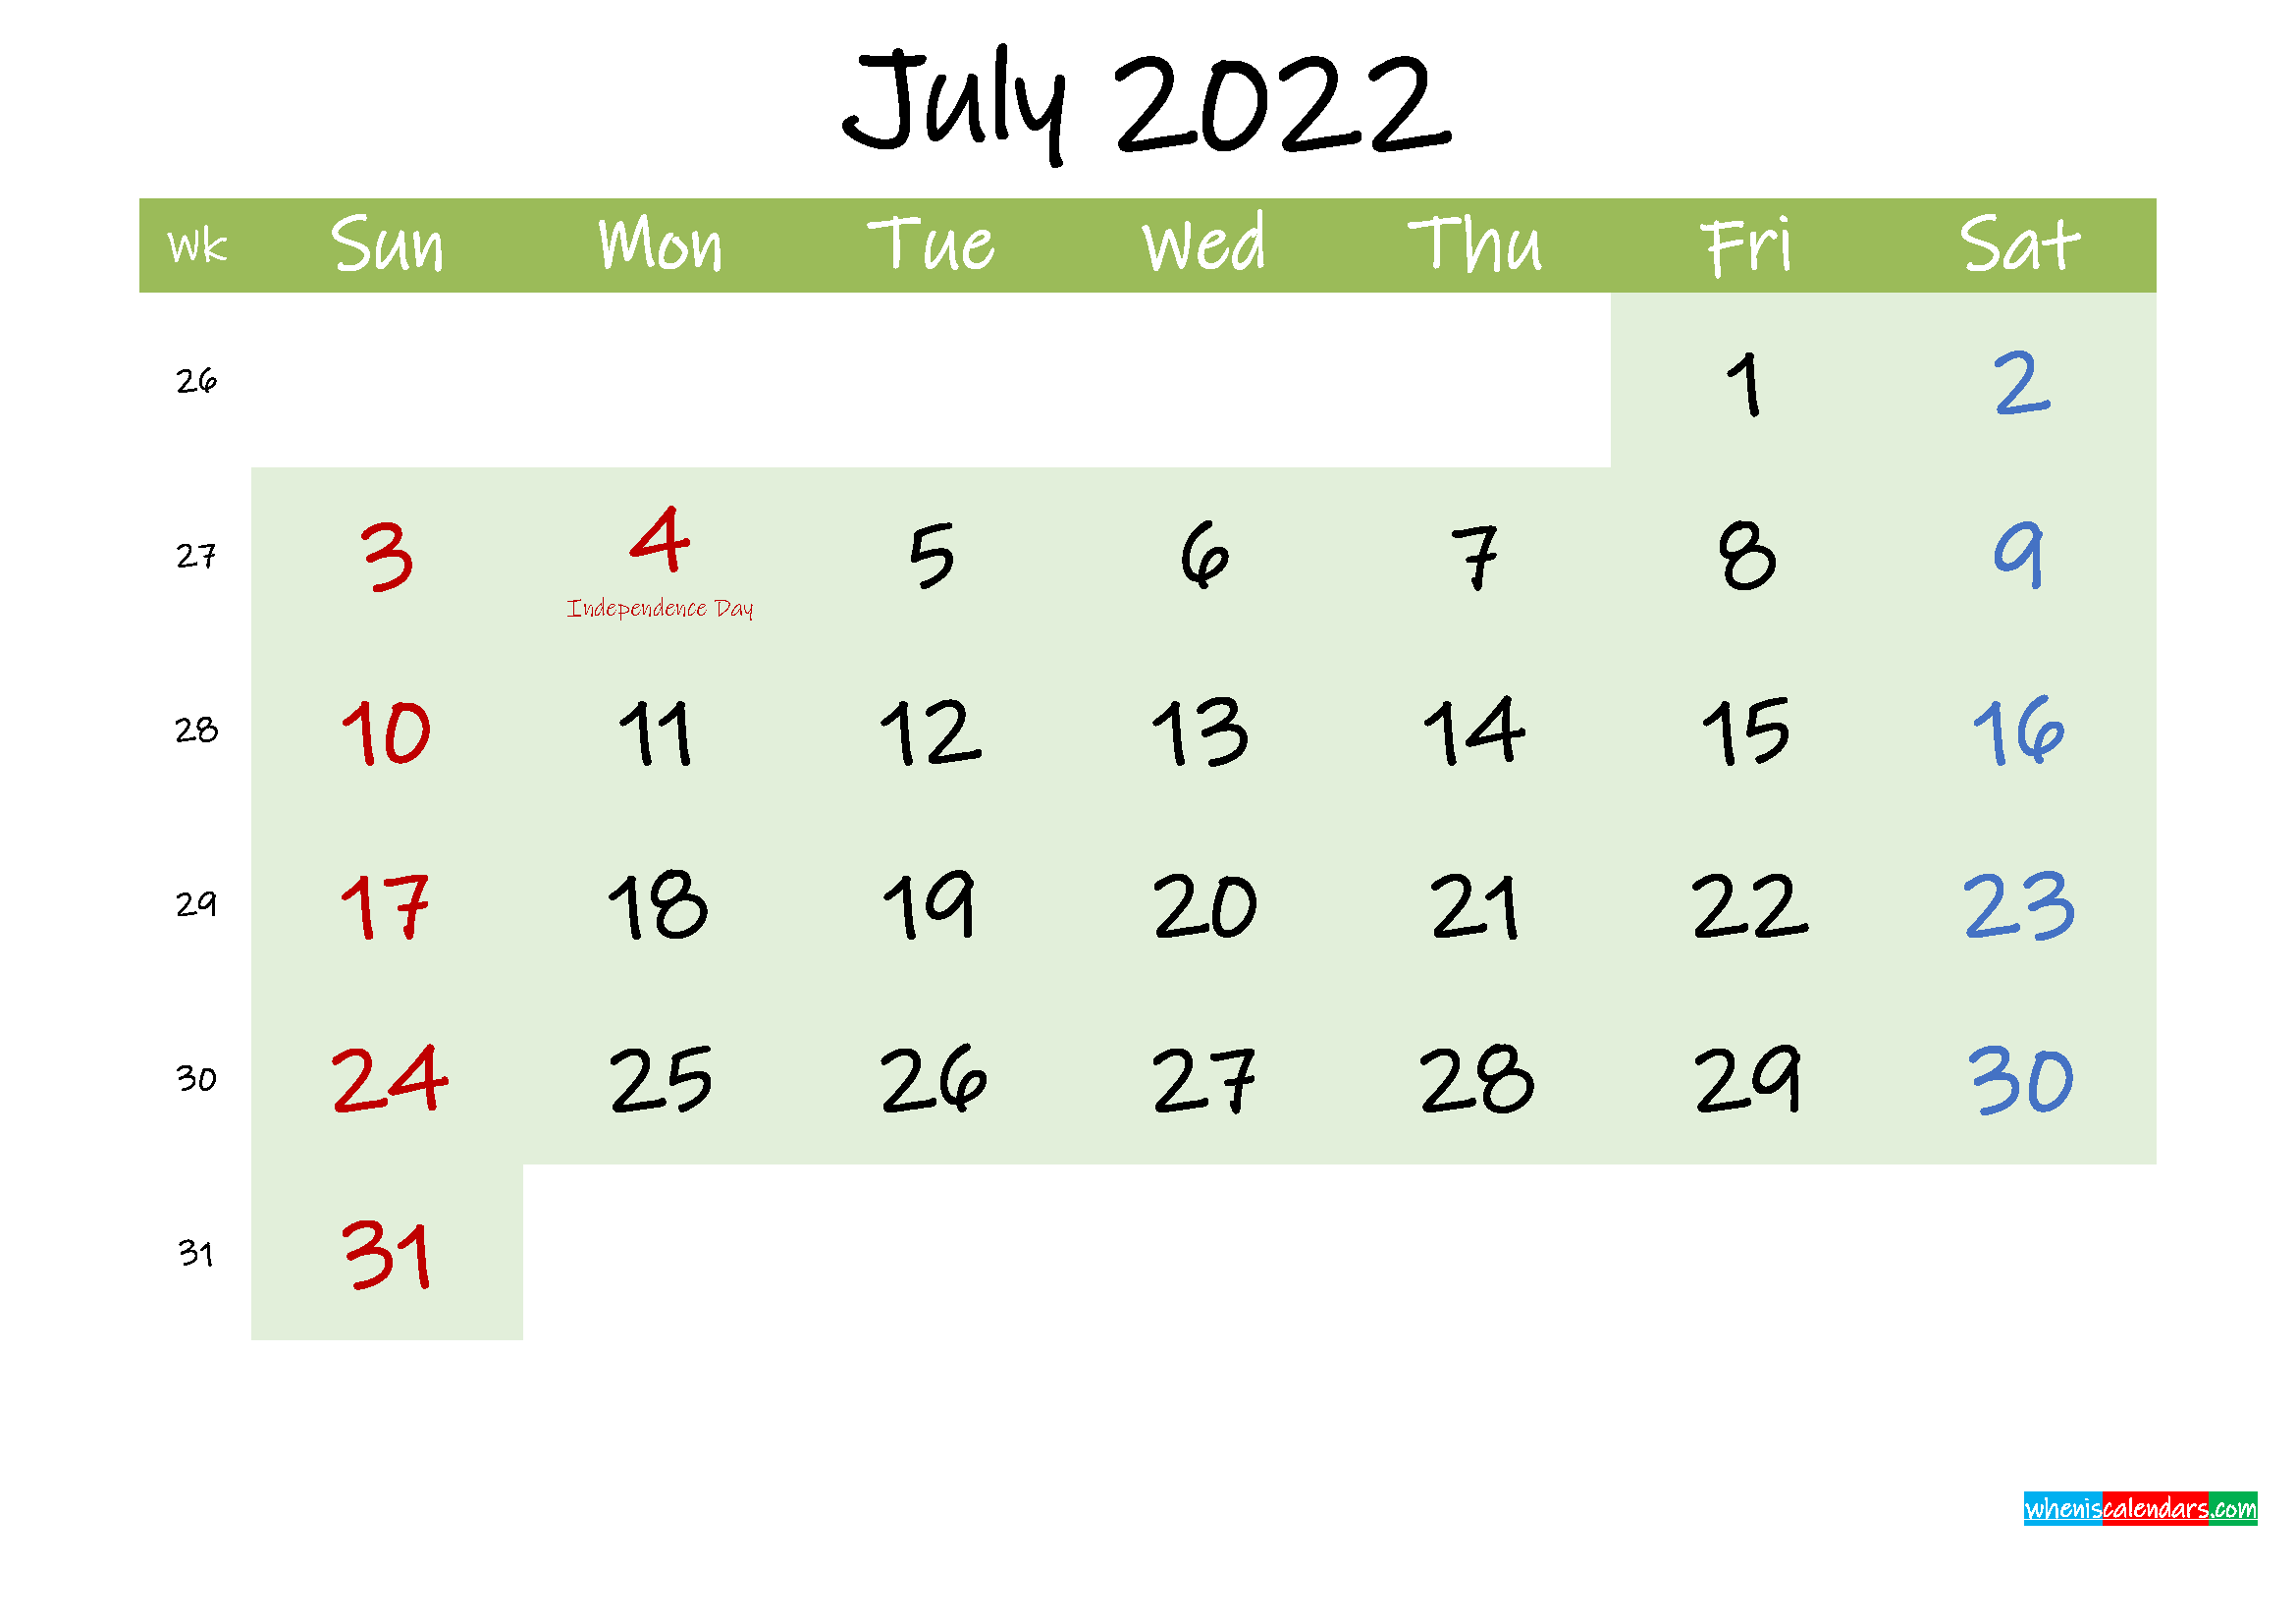 July 2022 Calendar with Holidays Printable